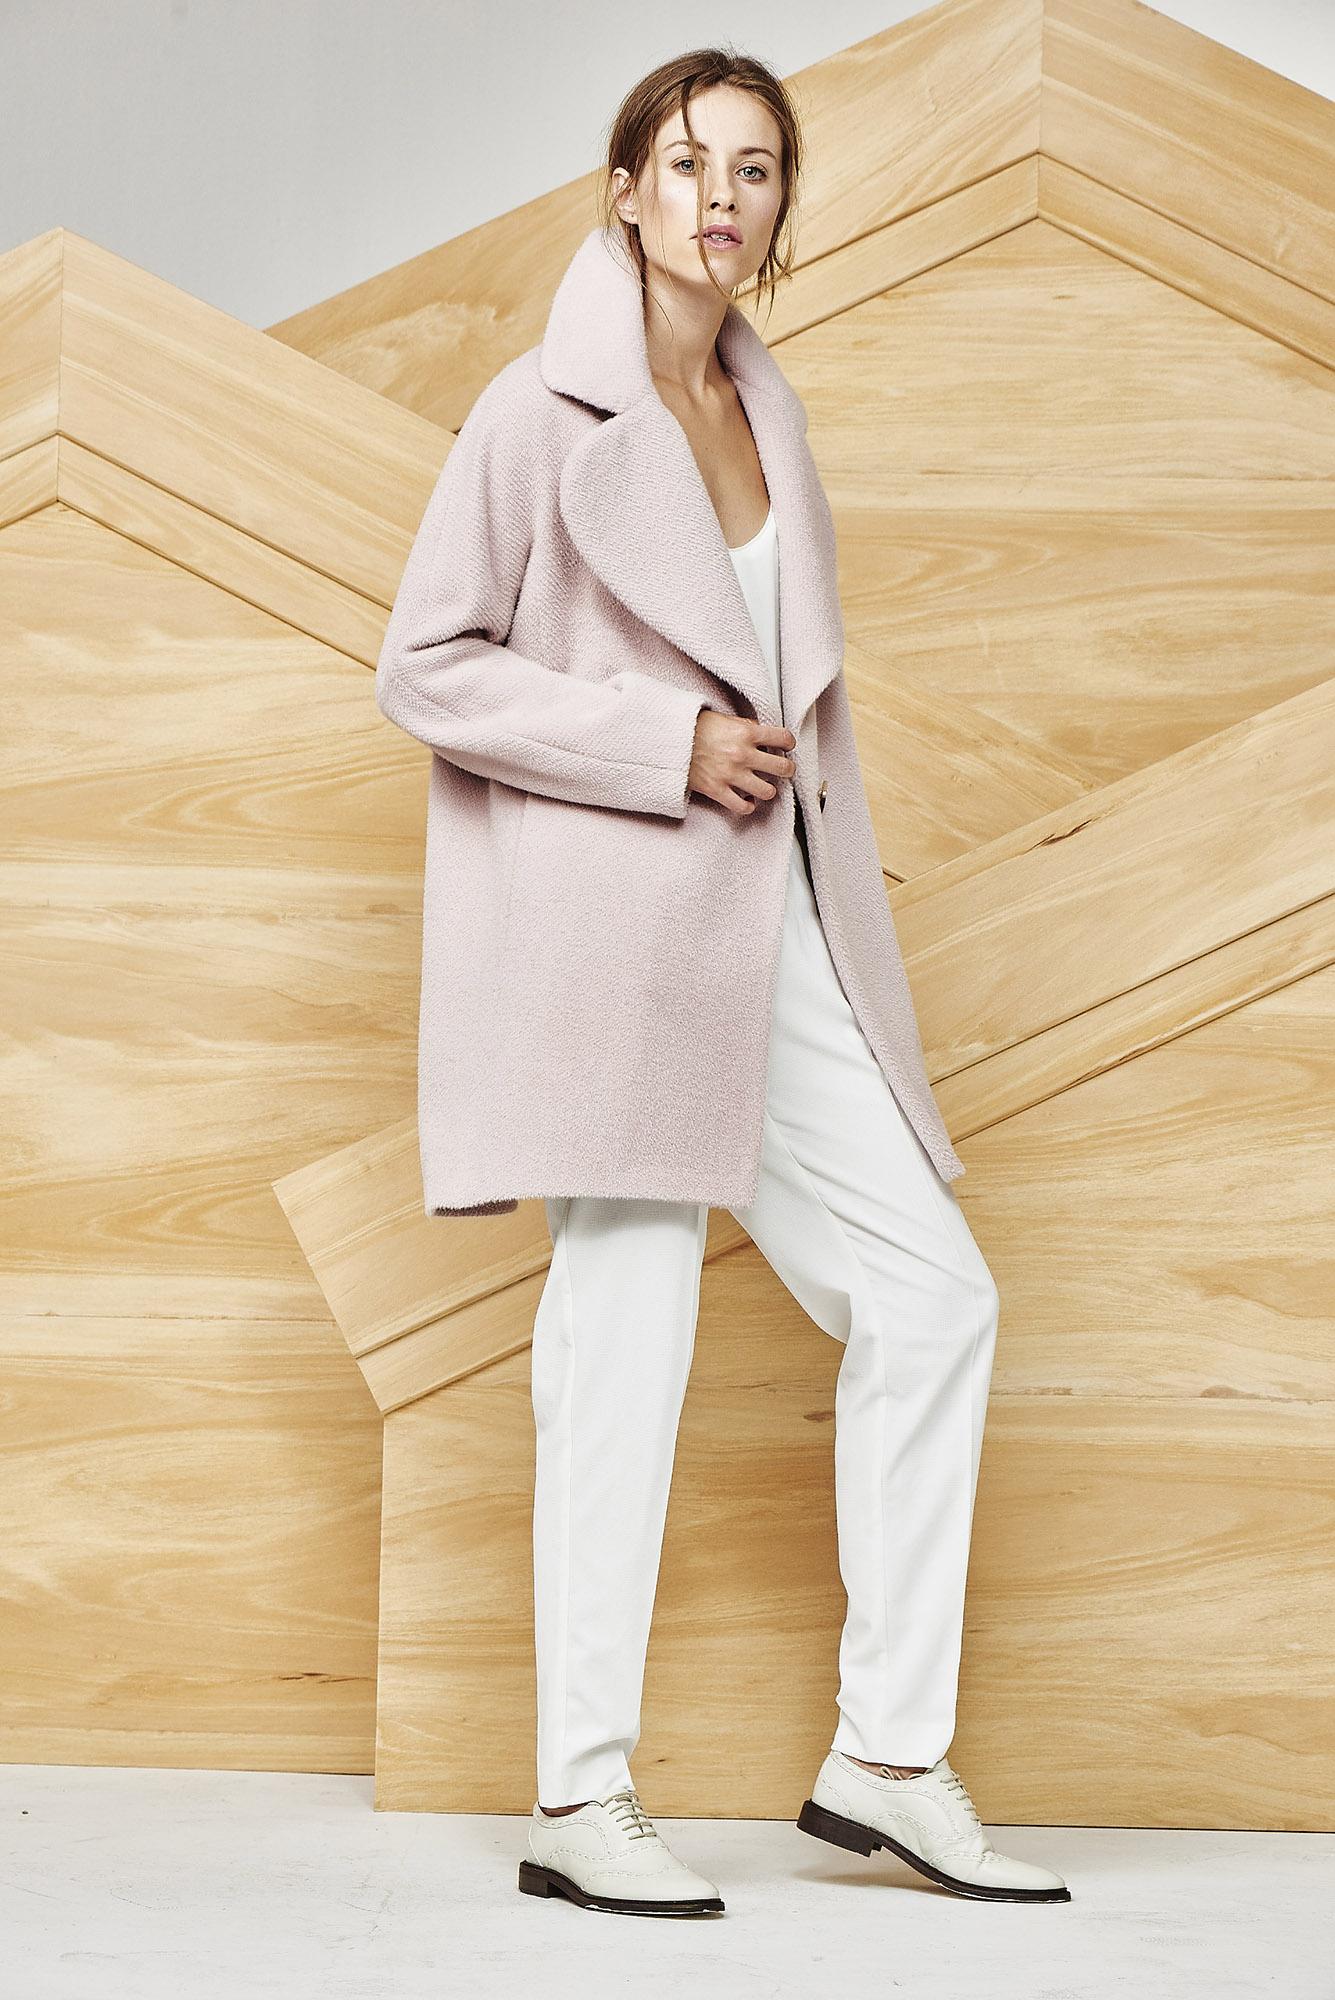 COAT MARIELLA   Colors: winter white,  soft rose,  burgundy, coffee melange, black  Sizes: S, M, L, XL